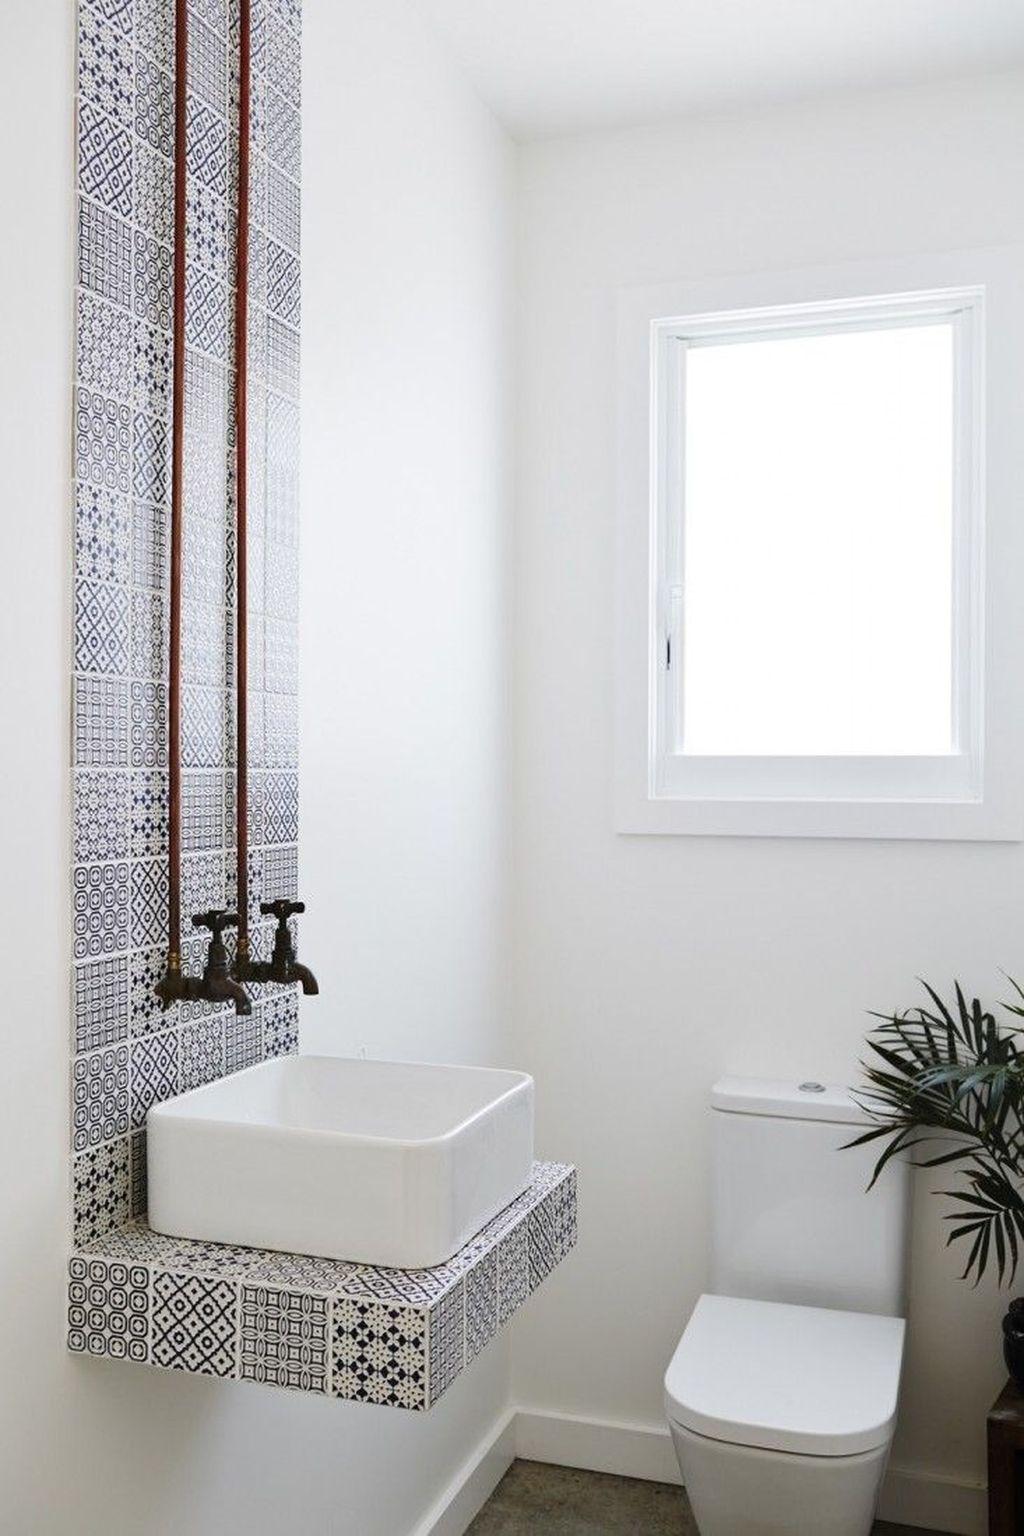 39 Cool And Stylish Small Bathroom Design Ideas36